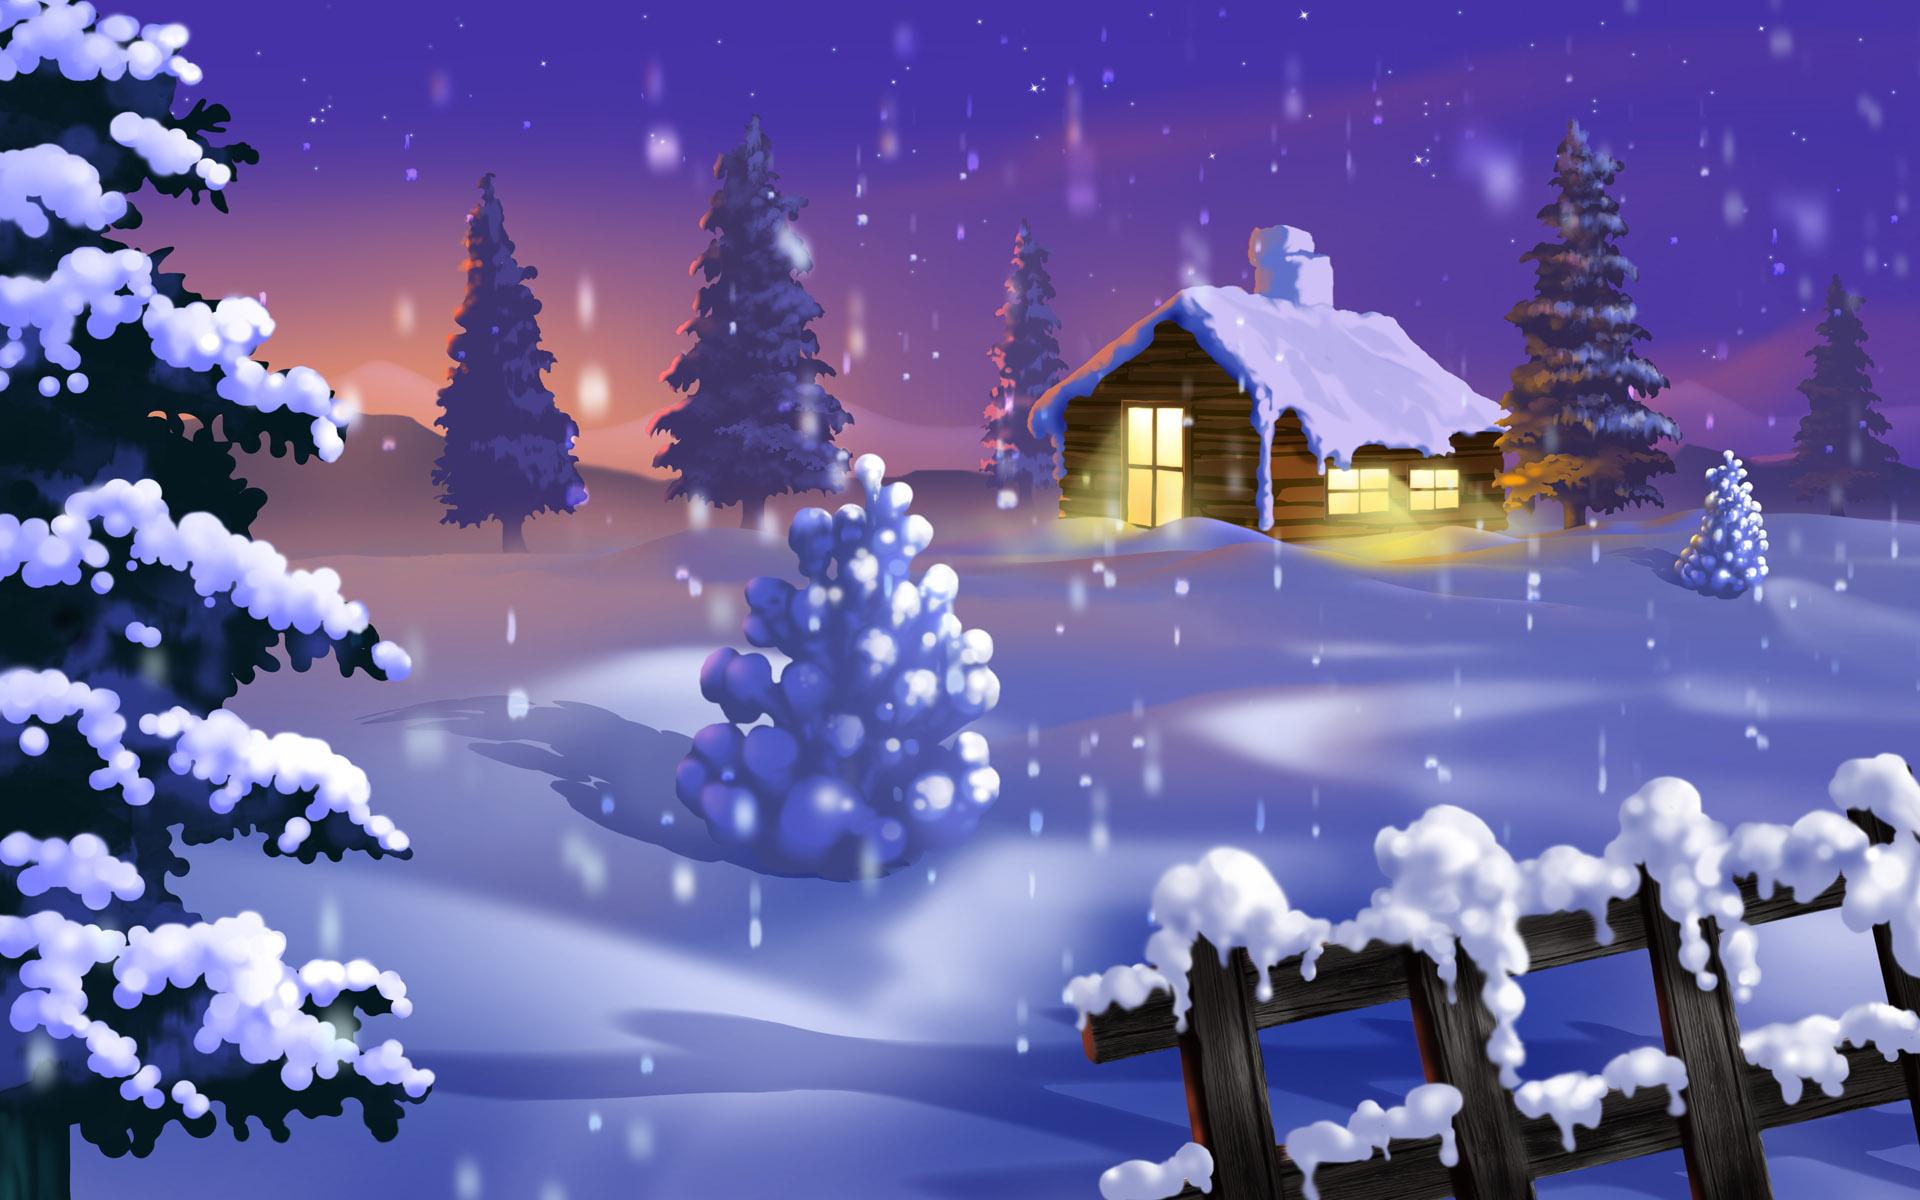 Holiday Wallpapers and Screensavers Desktop Image 1920x1200